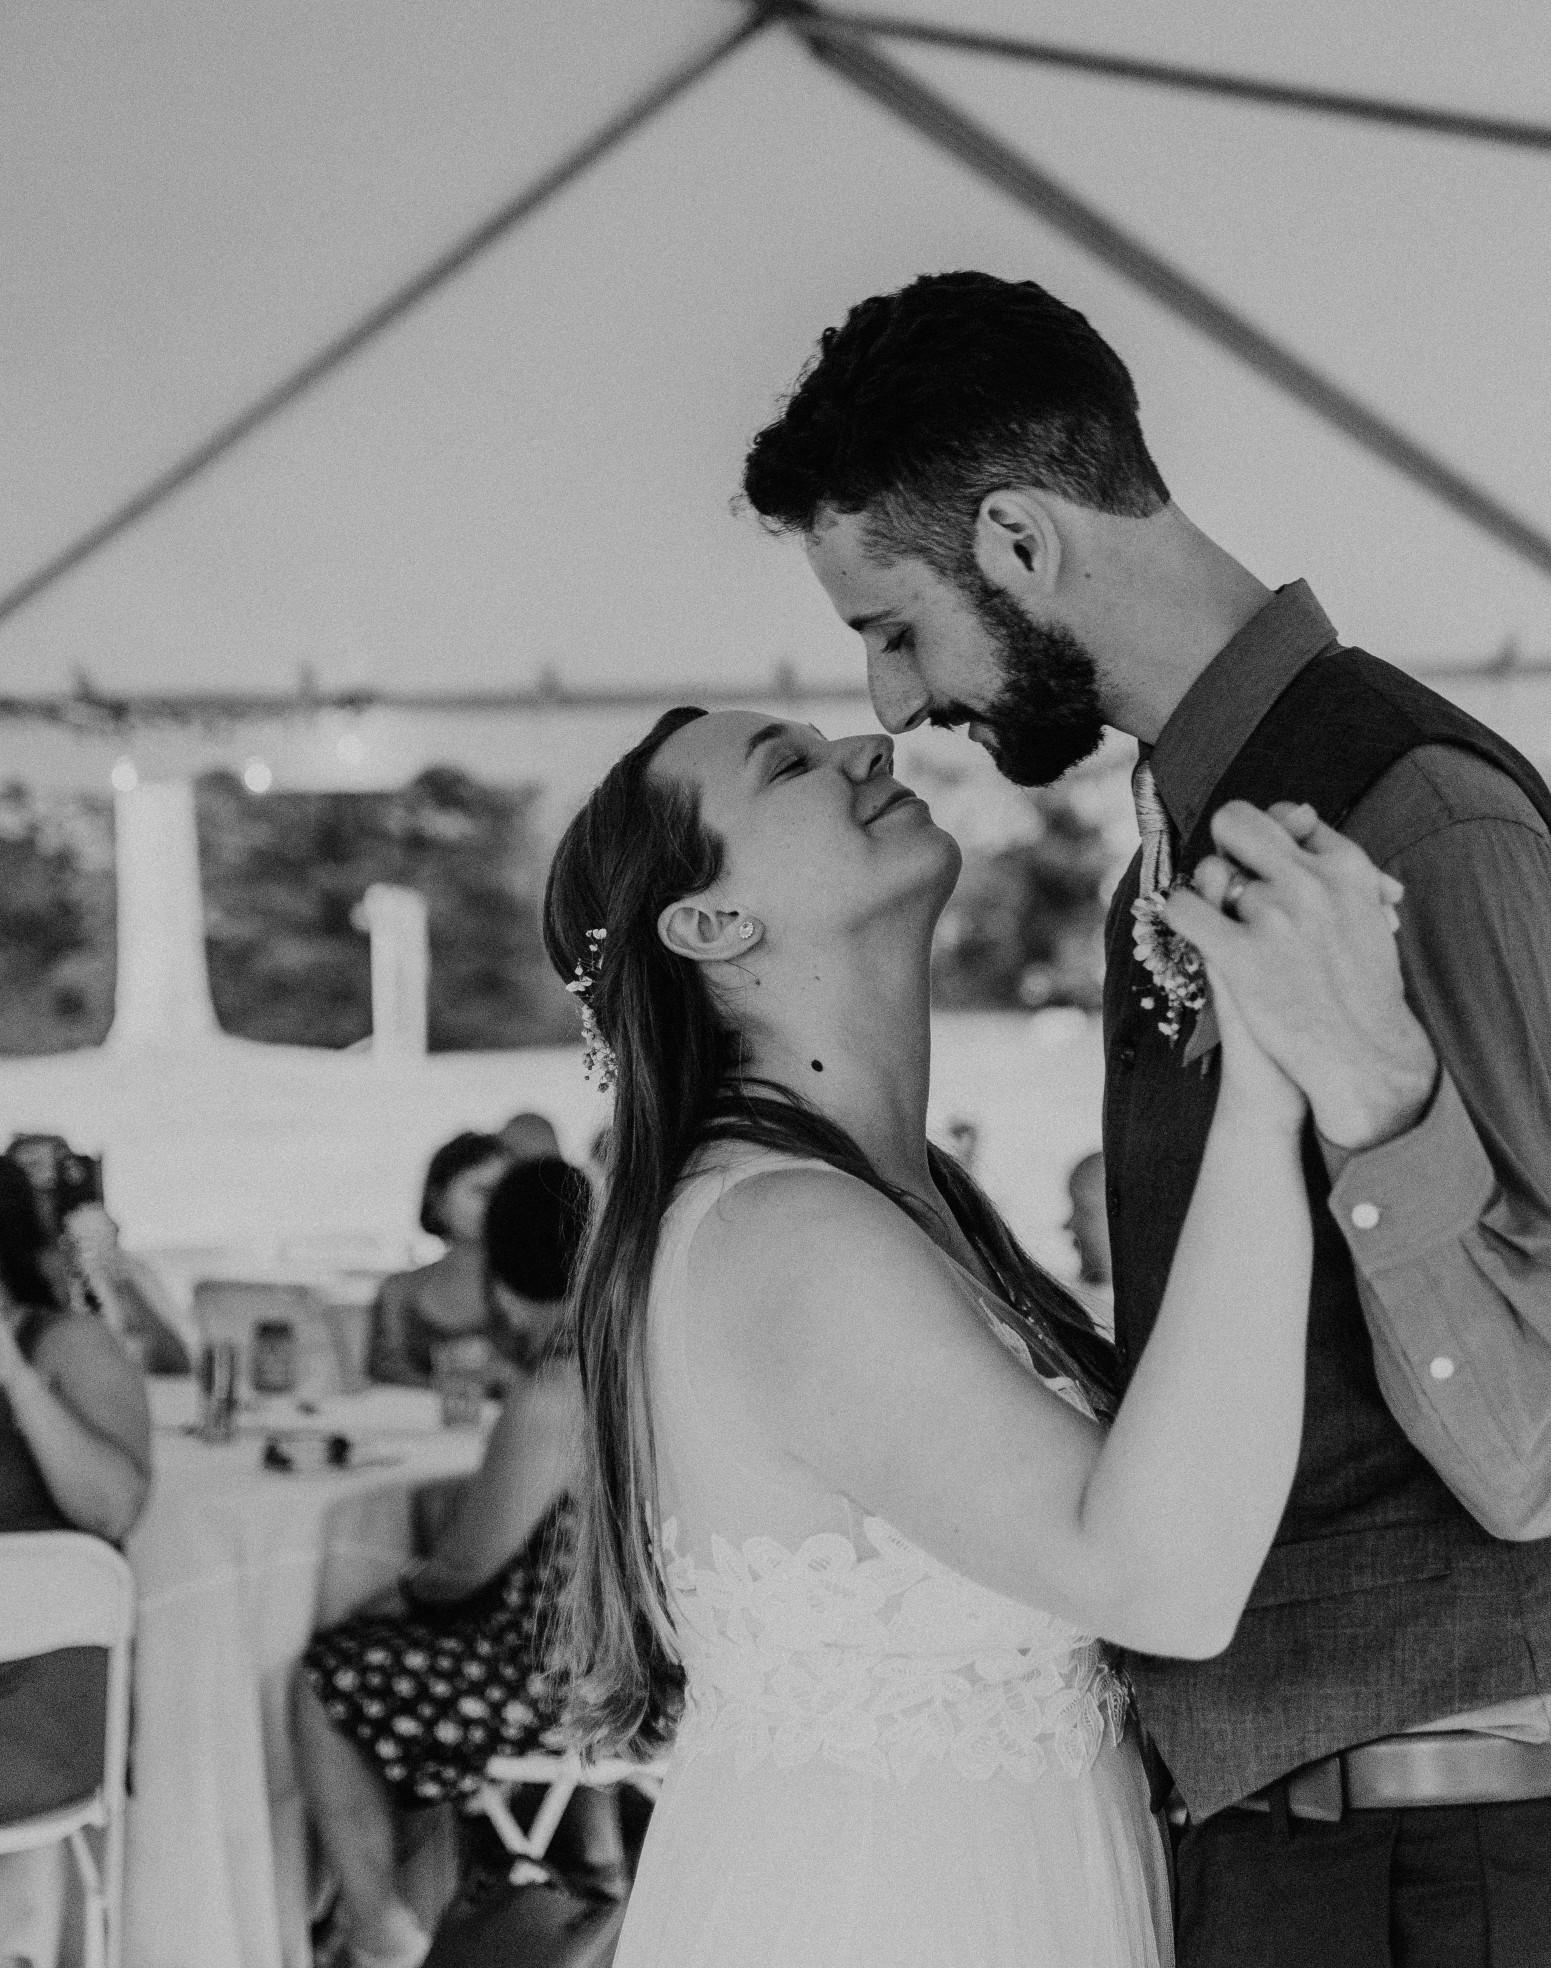 first-dance-wedding-photography.jpg.